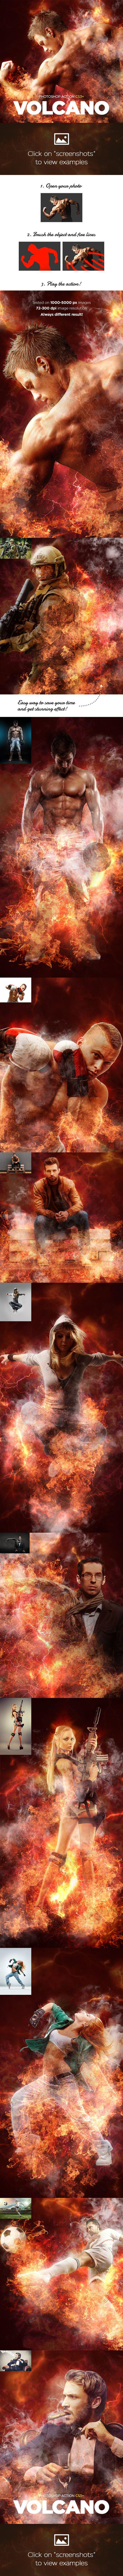 Volcano CS3+ Photoshop Action  #explosion #destruction • Download ➝ https://graphicriver.net/item/volcano-cs3-photoshop-action/18069500?ref=pxcr